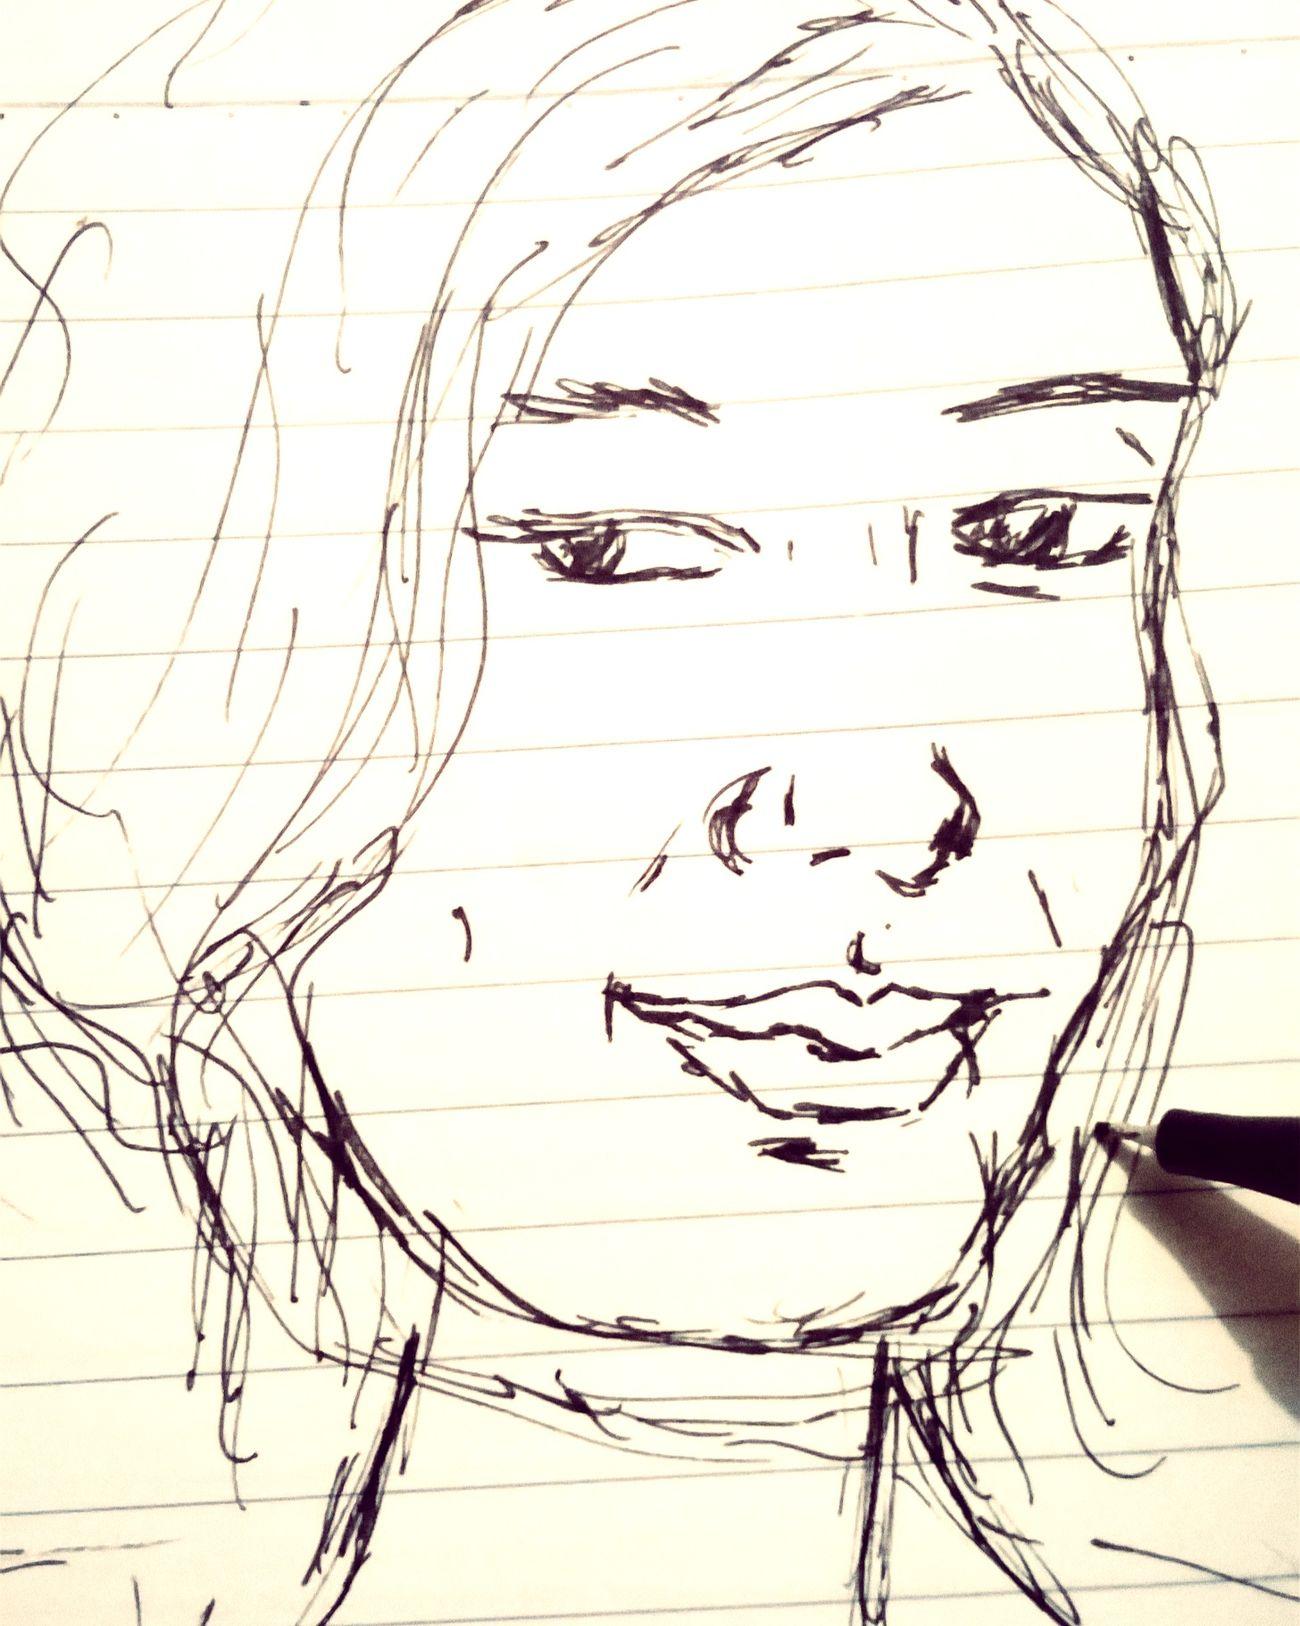 Drawing - Art Product Drawn Paper Creativity Drawing - Activity Drawing Me